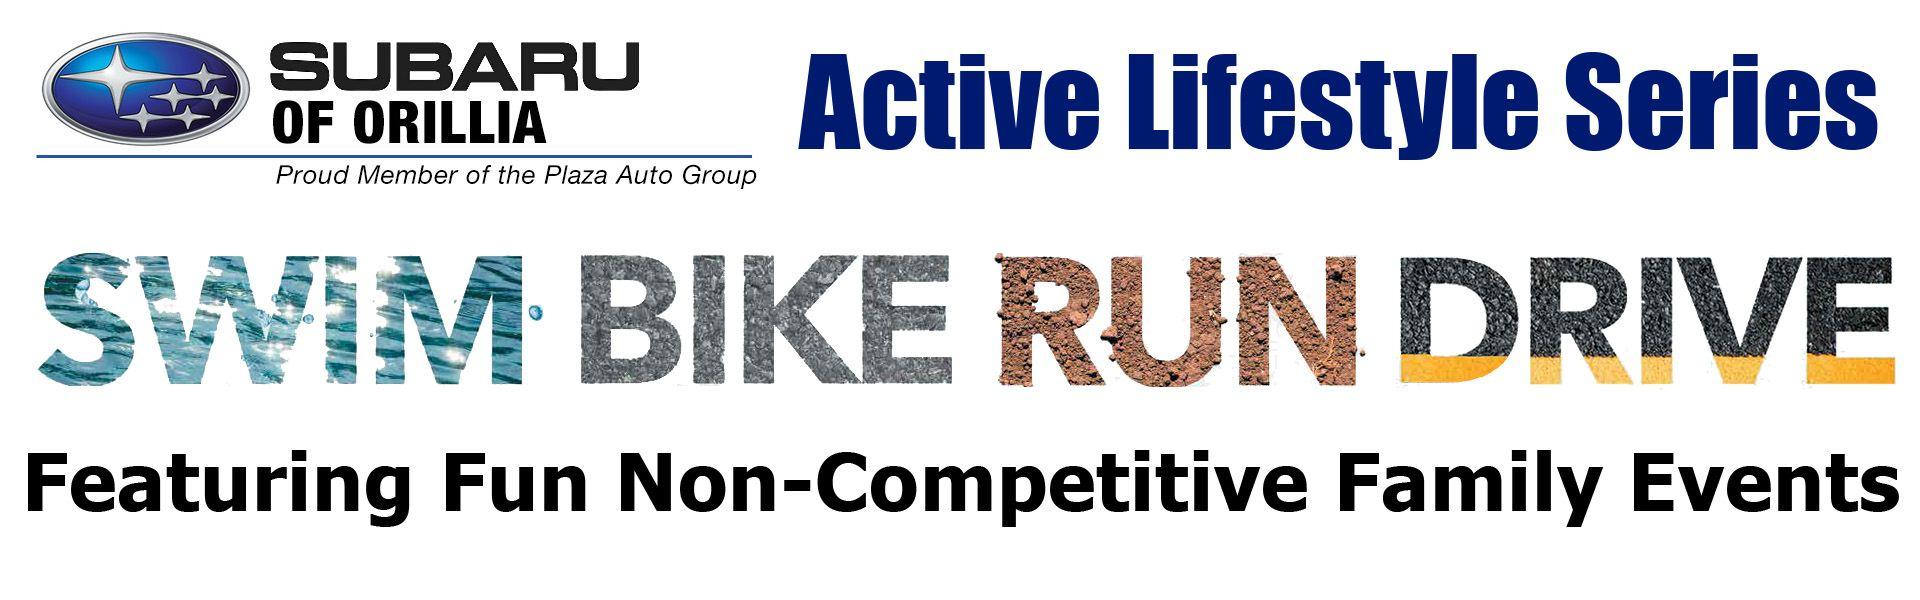 Active Lifestyle Series